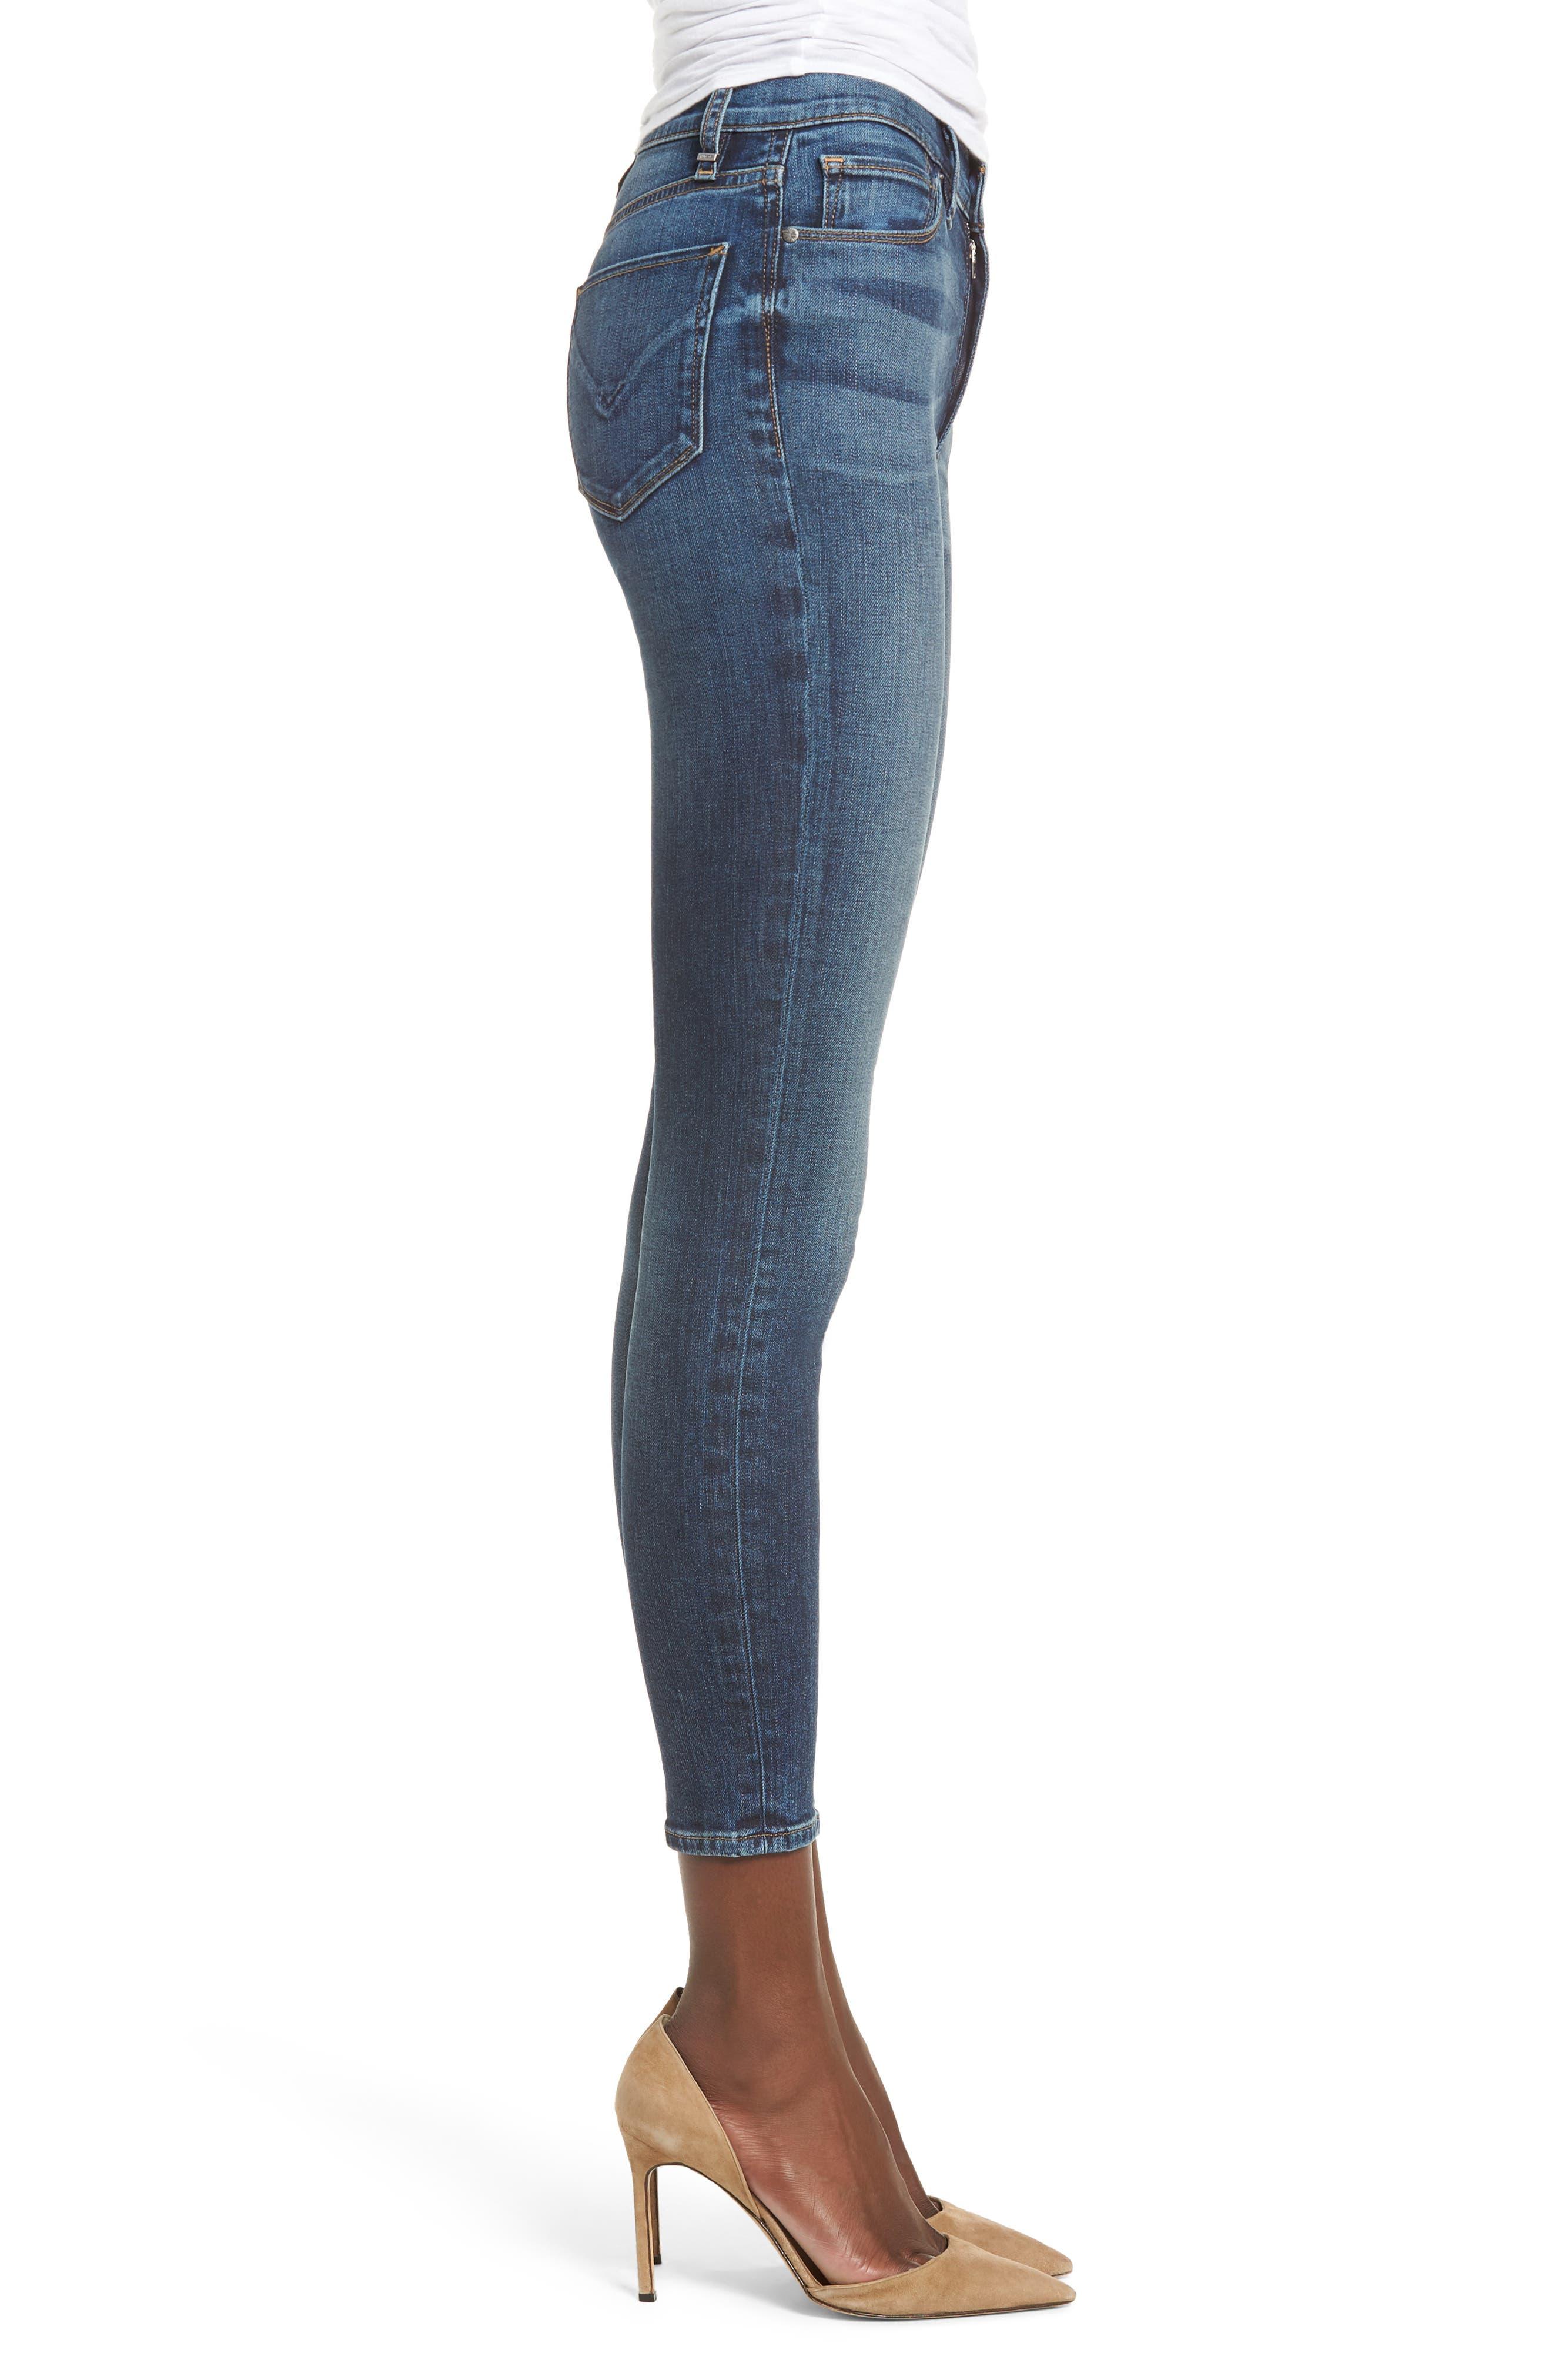 Barbara High Waist Ankle Skinny Jeans,                             Alternate thumbnail 3, color,                             CLEAN SIDE BAR